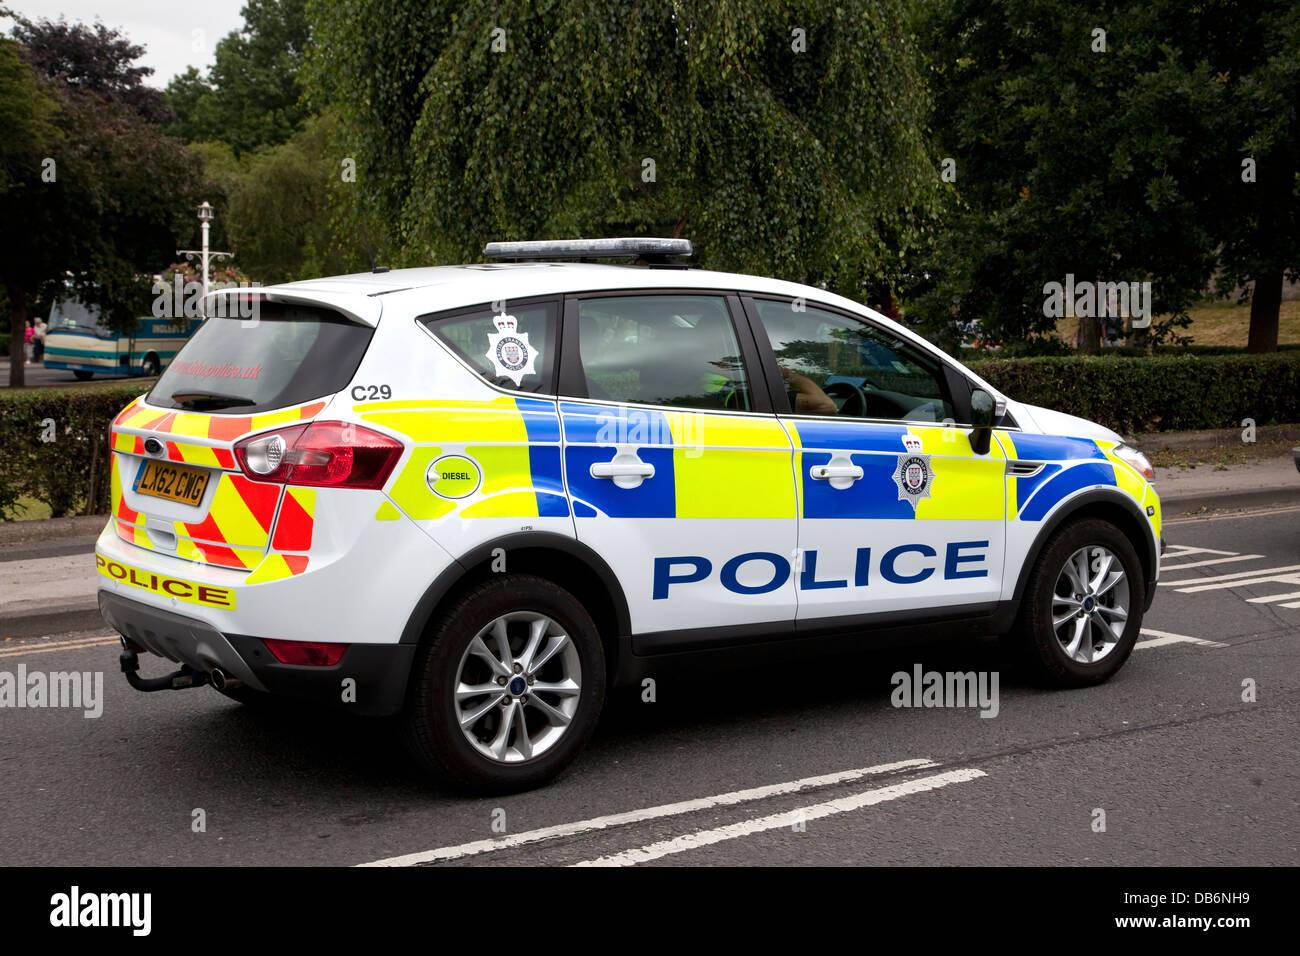 British police car